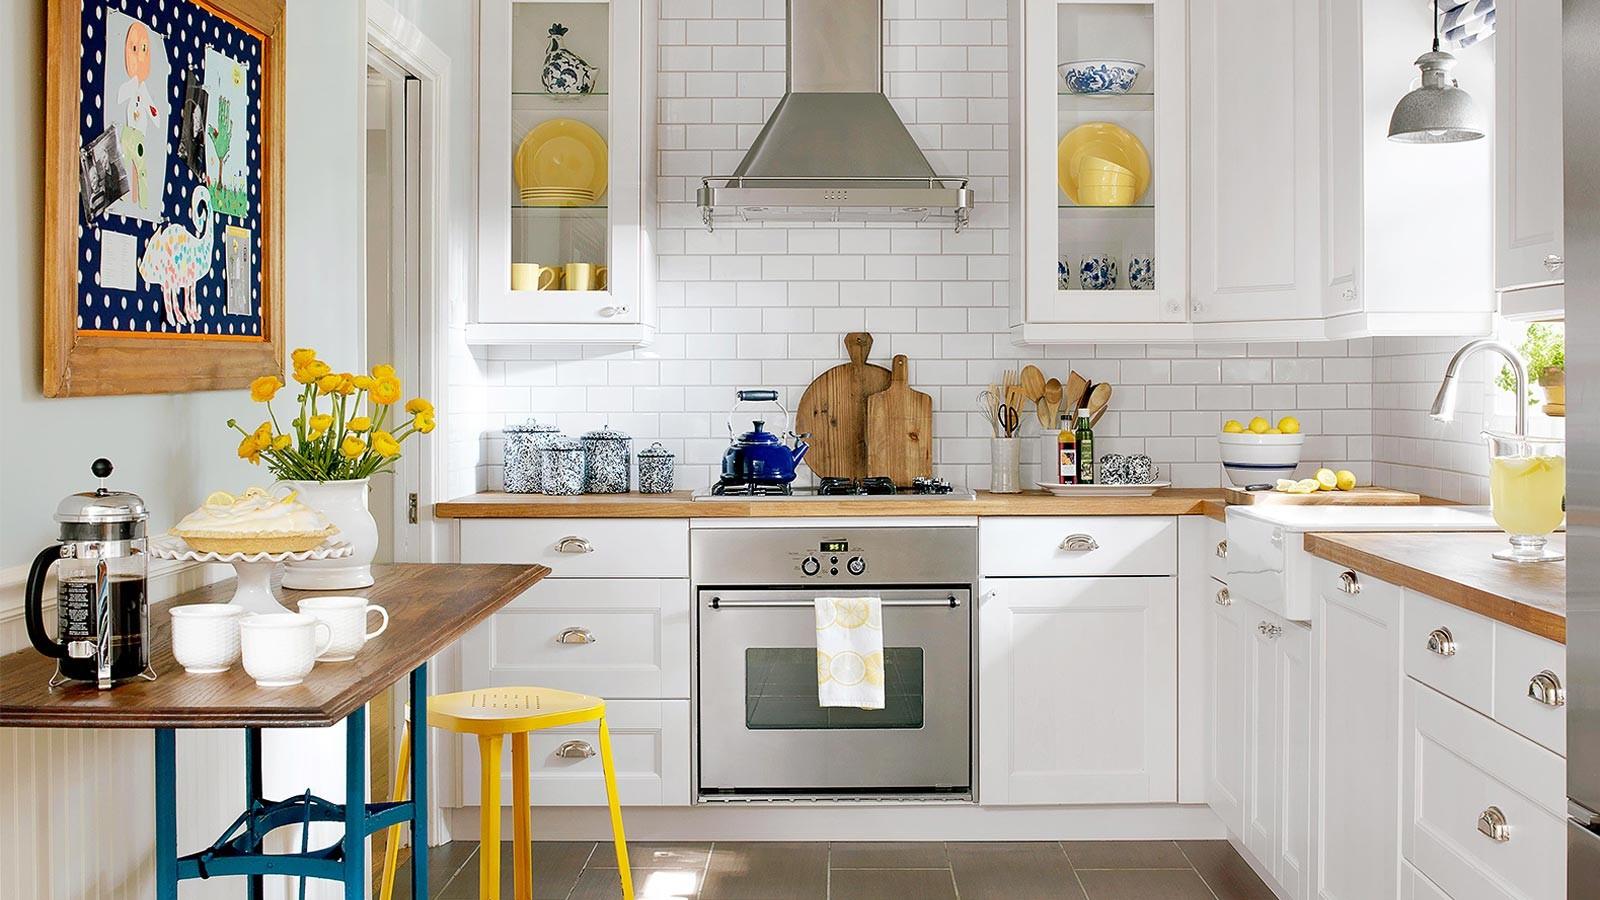 طراحی دکوراسیون با لوازم تزئینی آشپزخانه